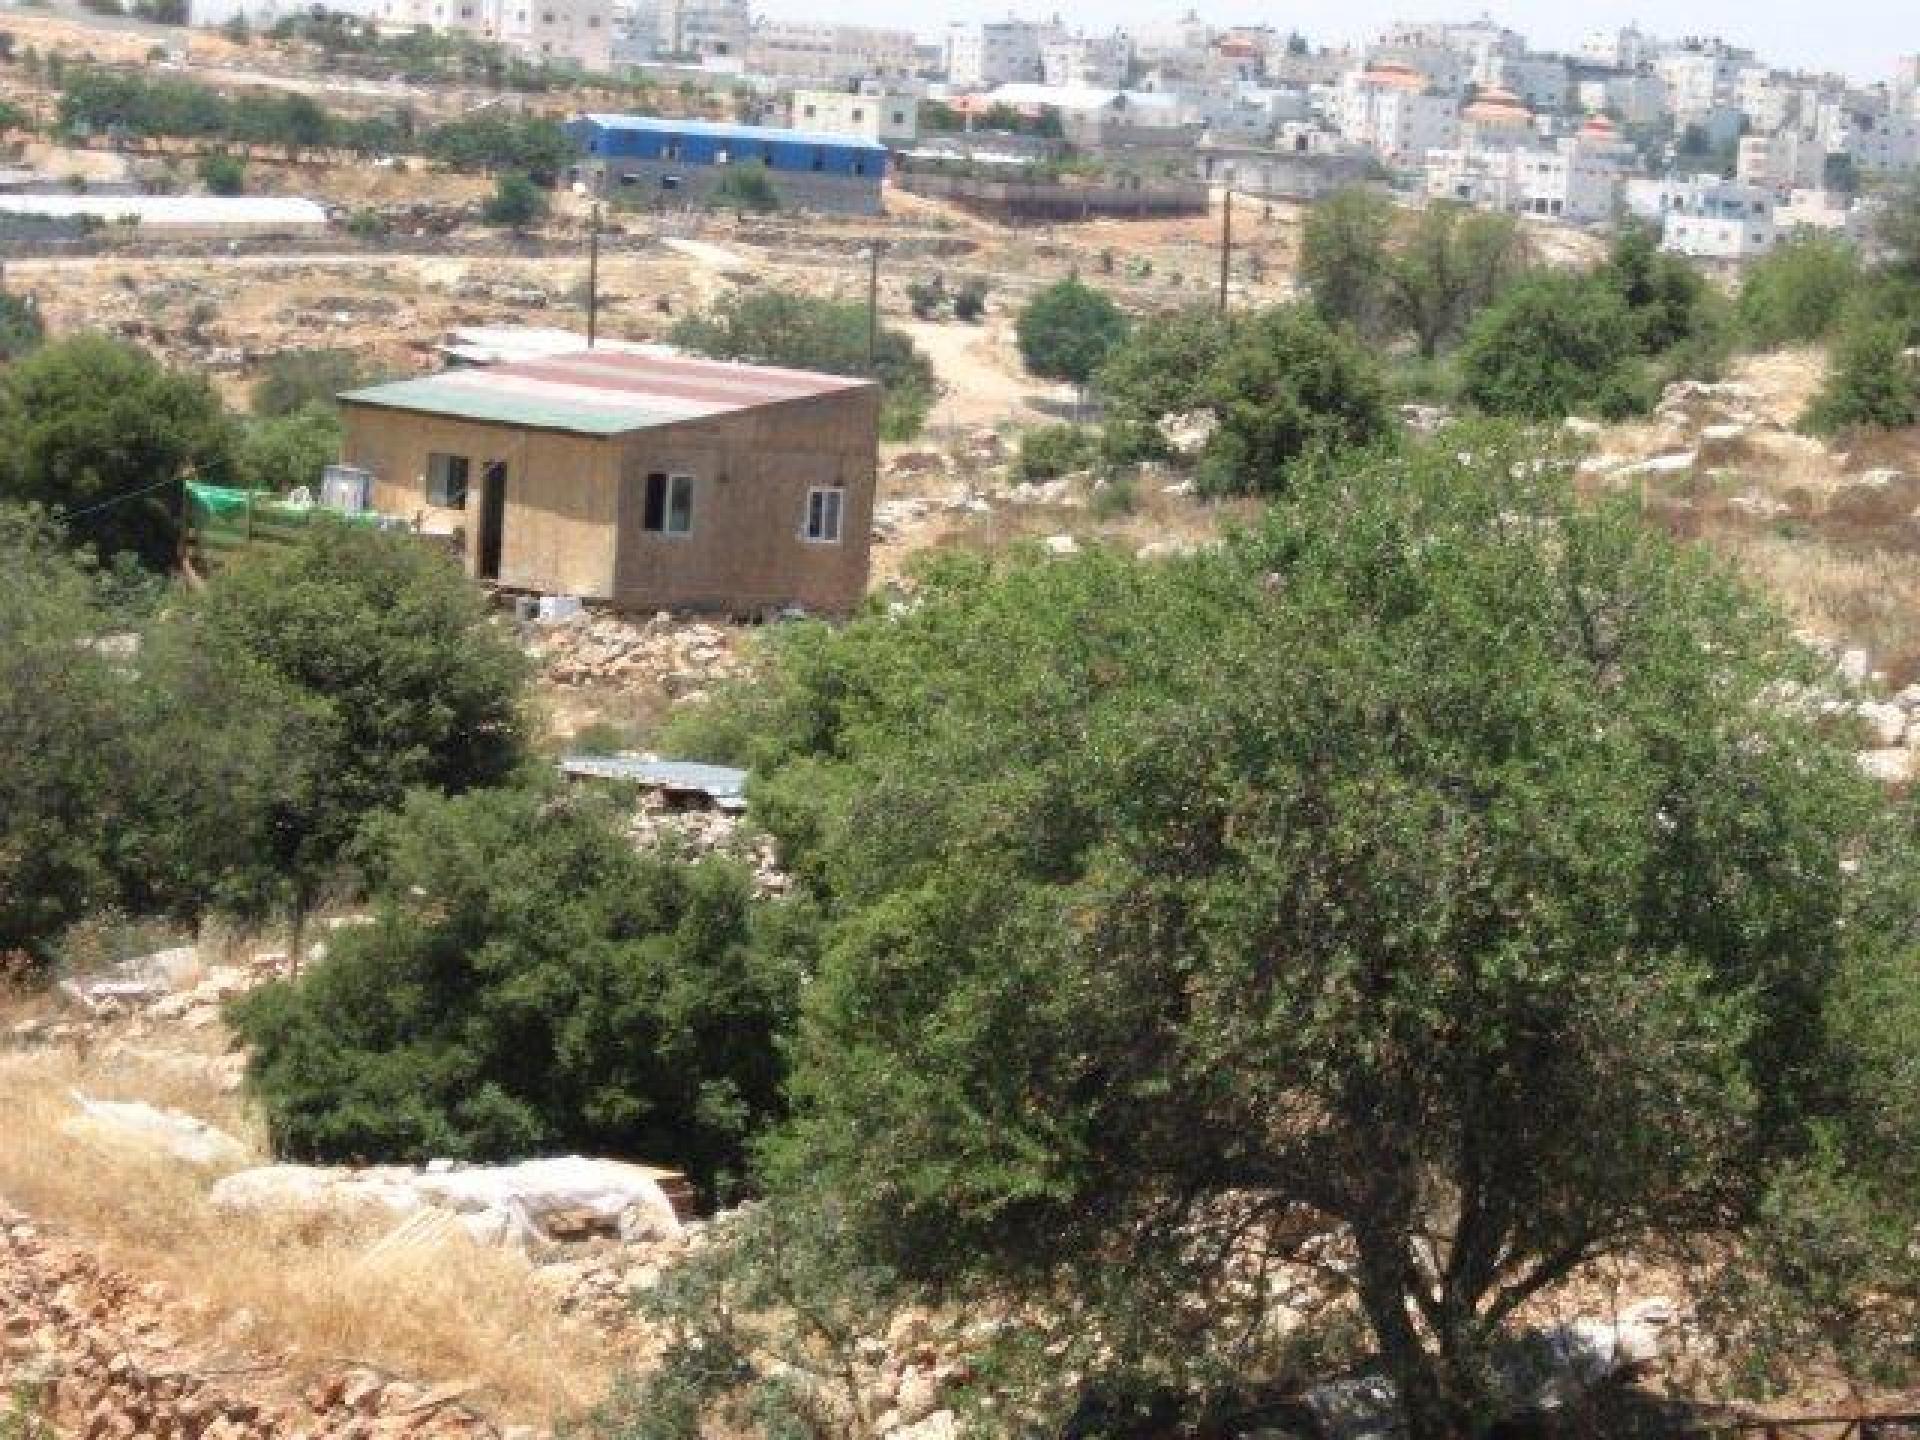 Hebron 21.06.11